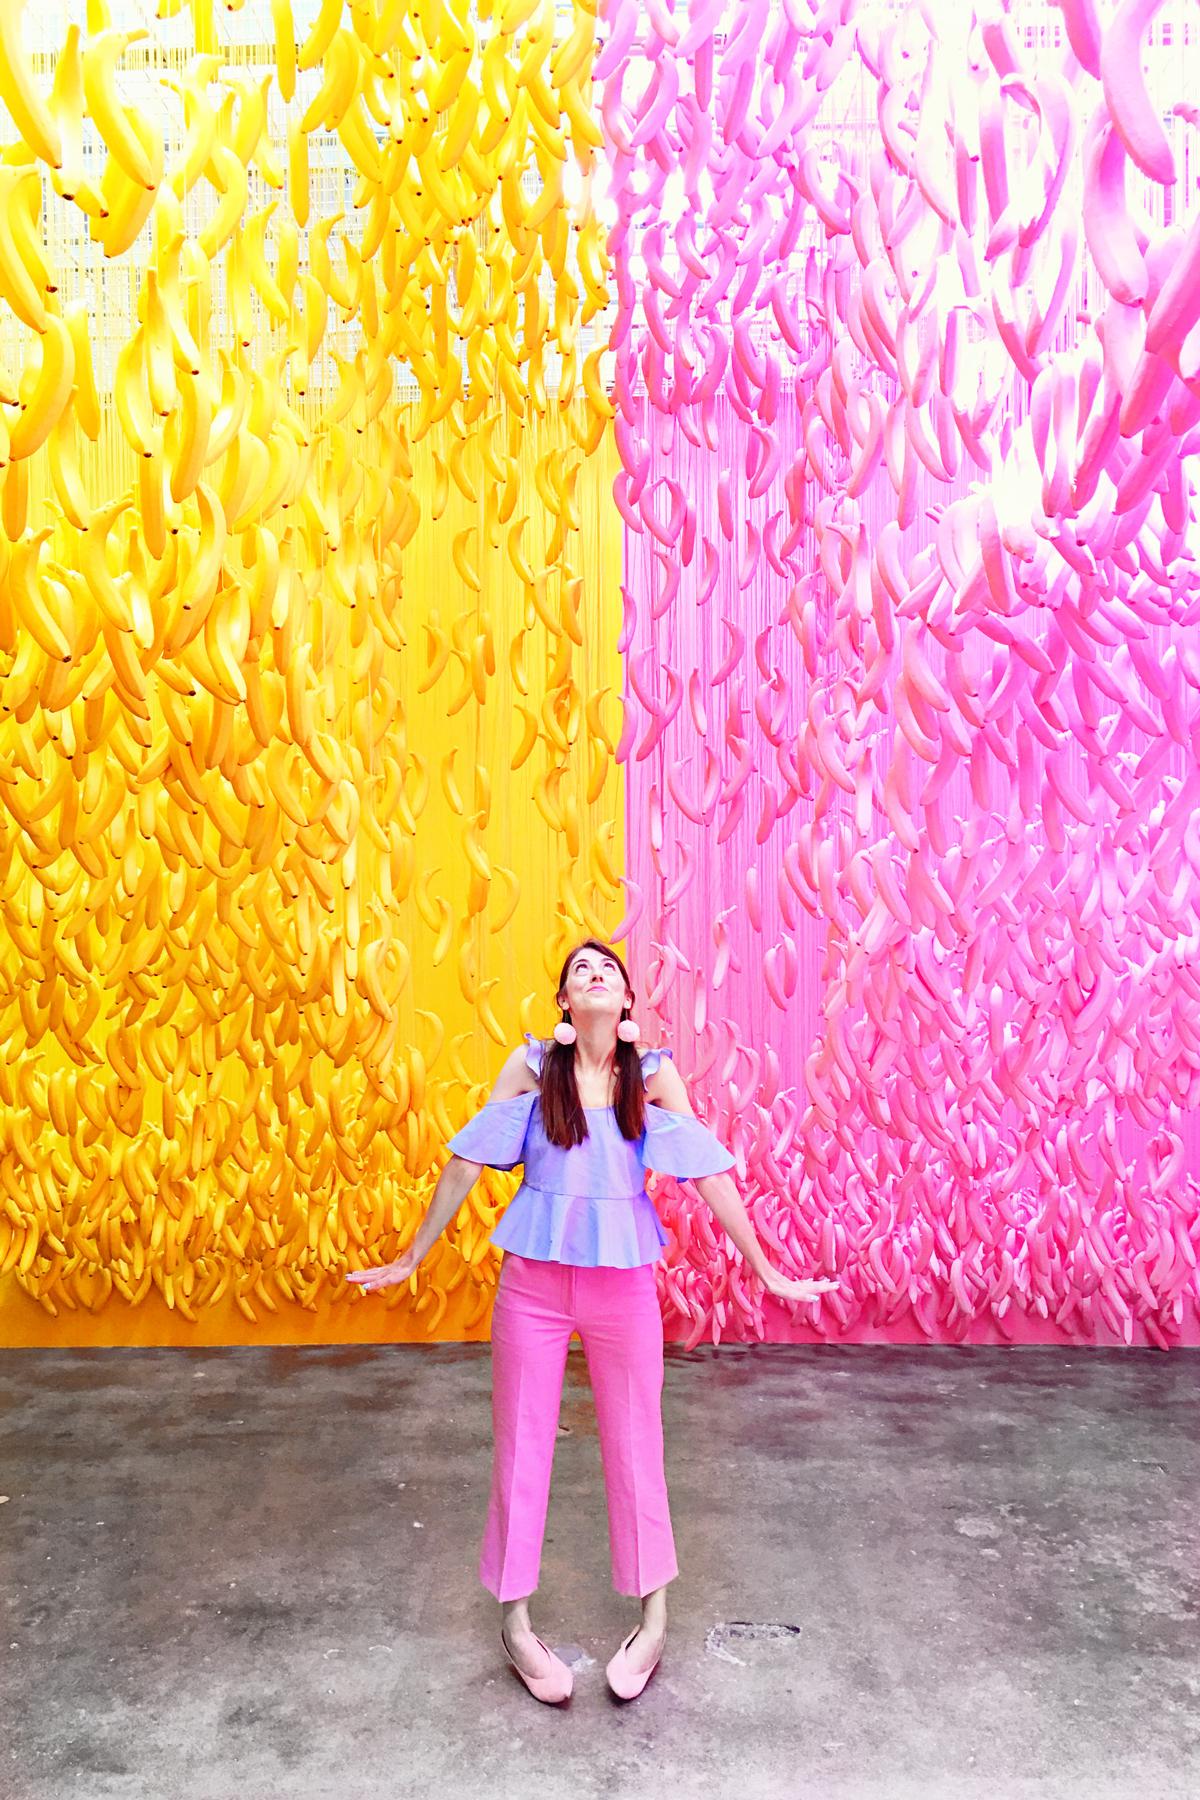 Museum of Ice Cream: Los Angeles - Studio DIY